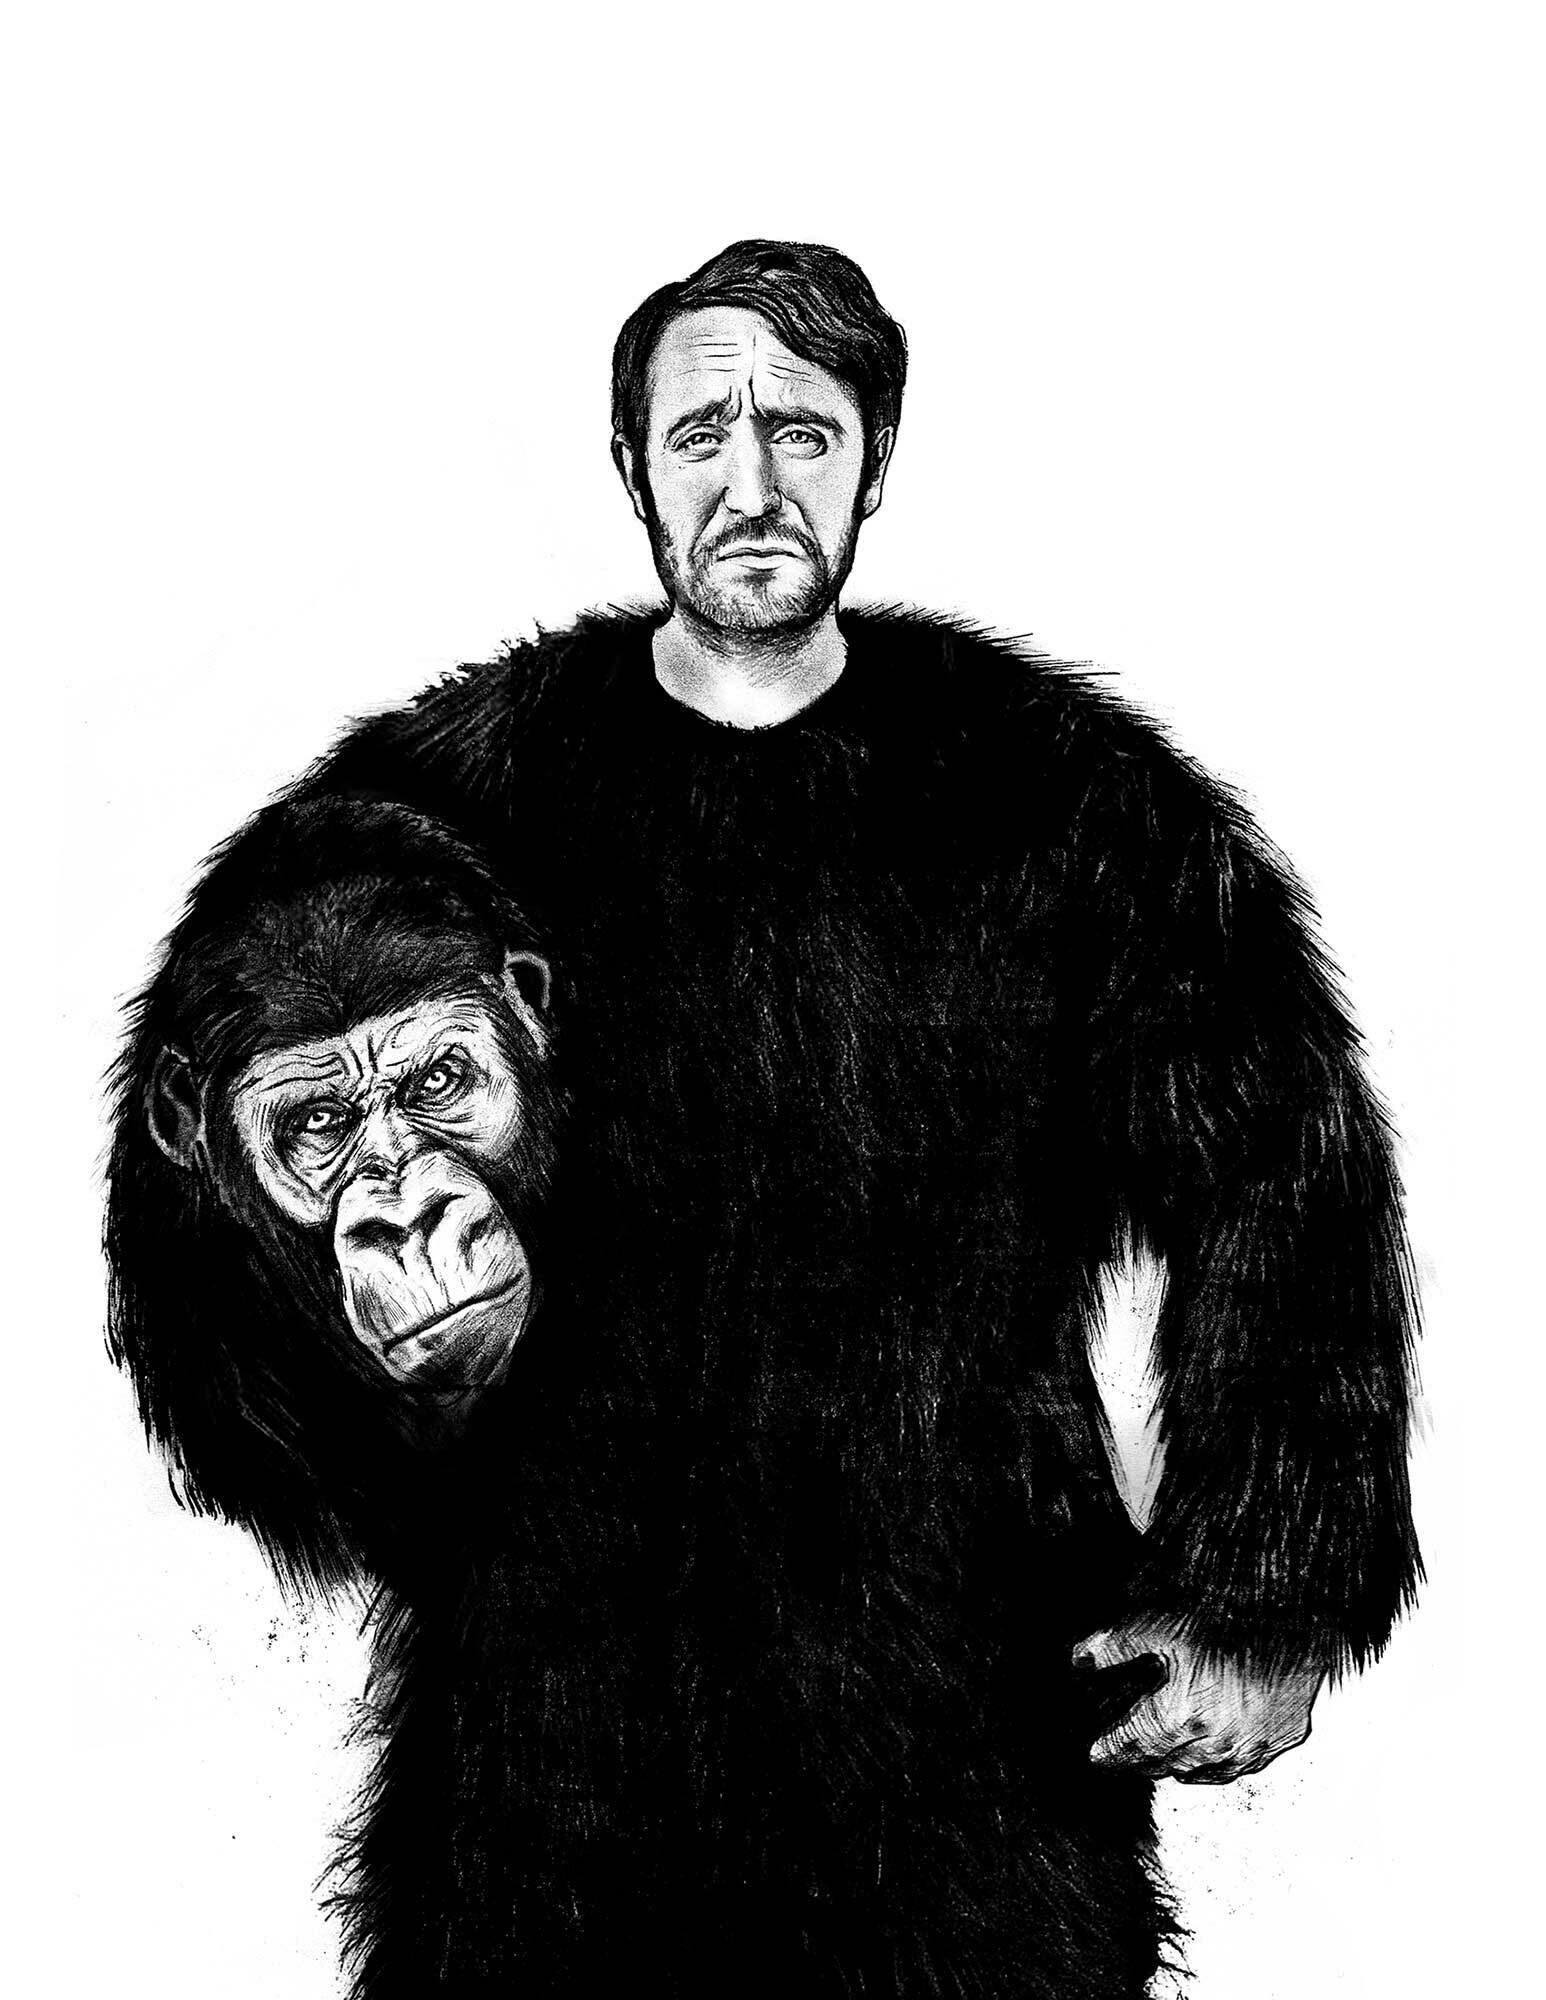 Editorial illustration man ape masculine maskulin - Kornel Illustration | Kornel Stadler portfolio